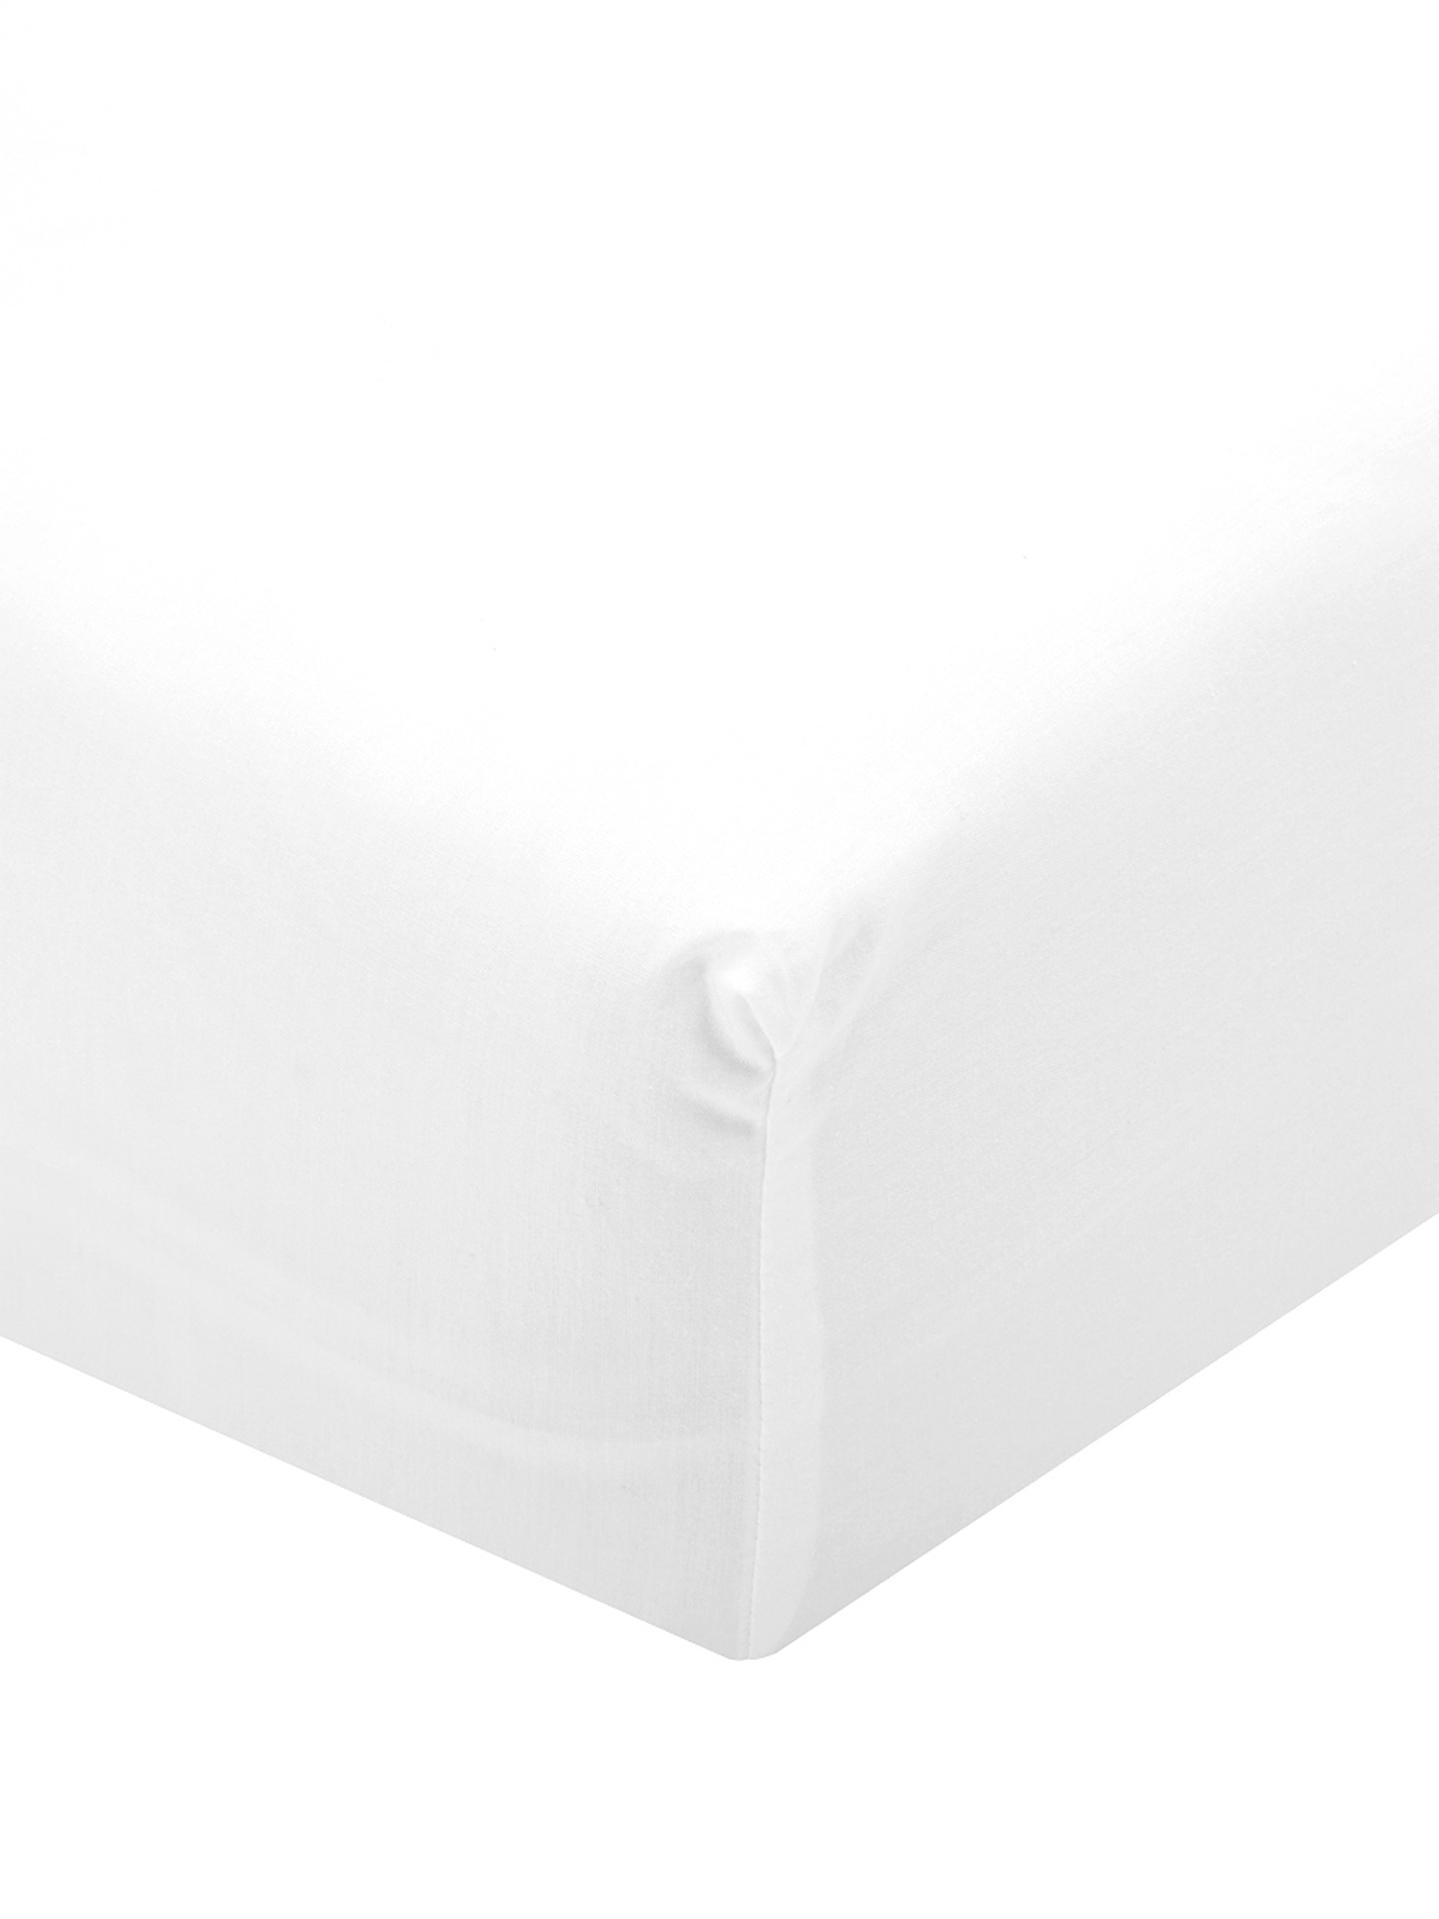 Sábana bajera de percal Elsie, Blanco, Cama 90 cm (90 x 200 cm)